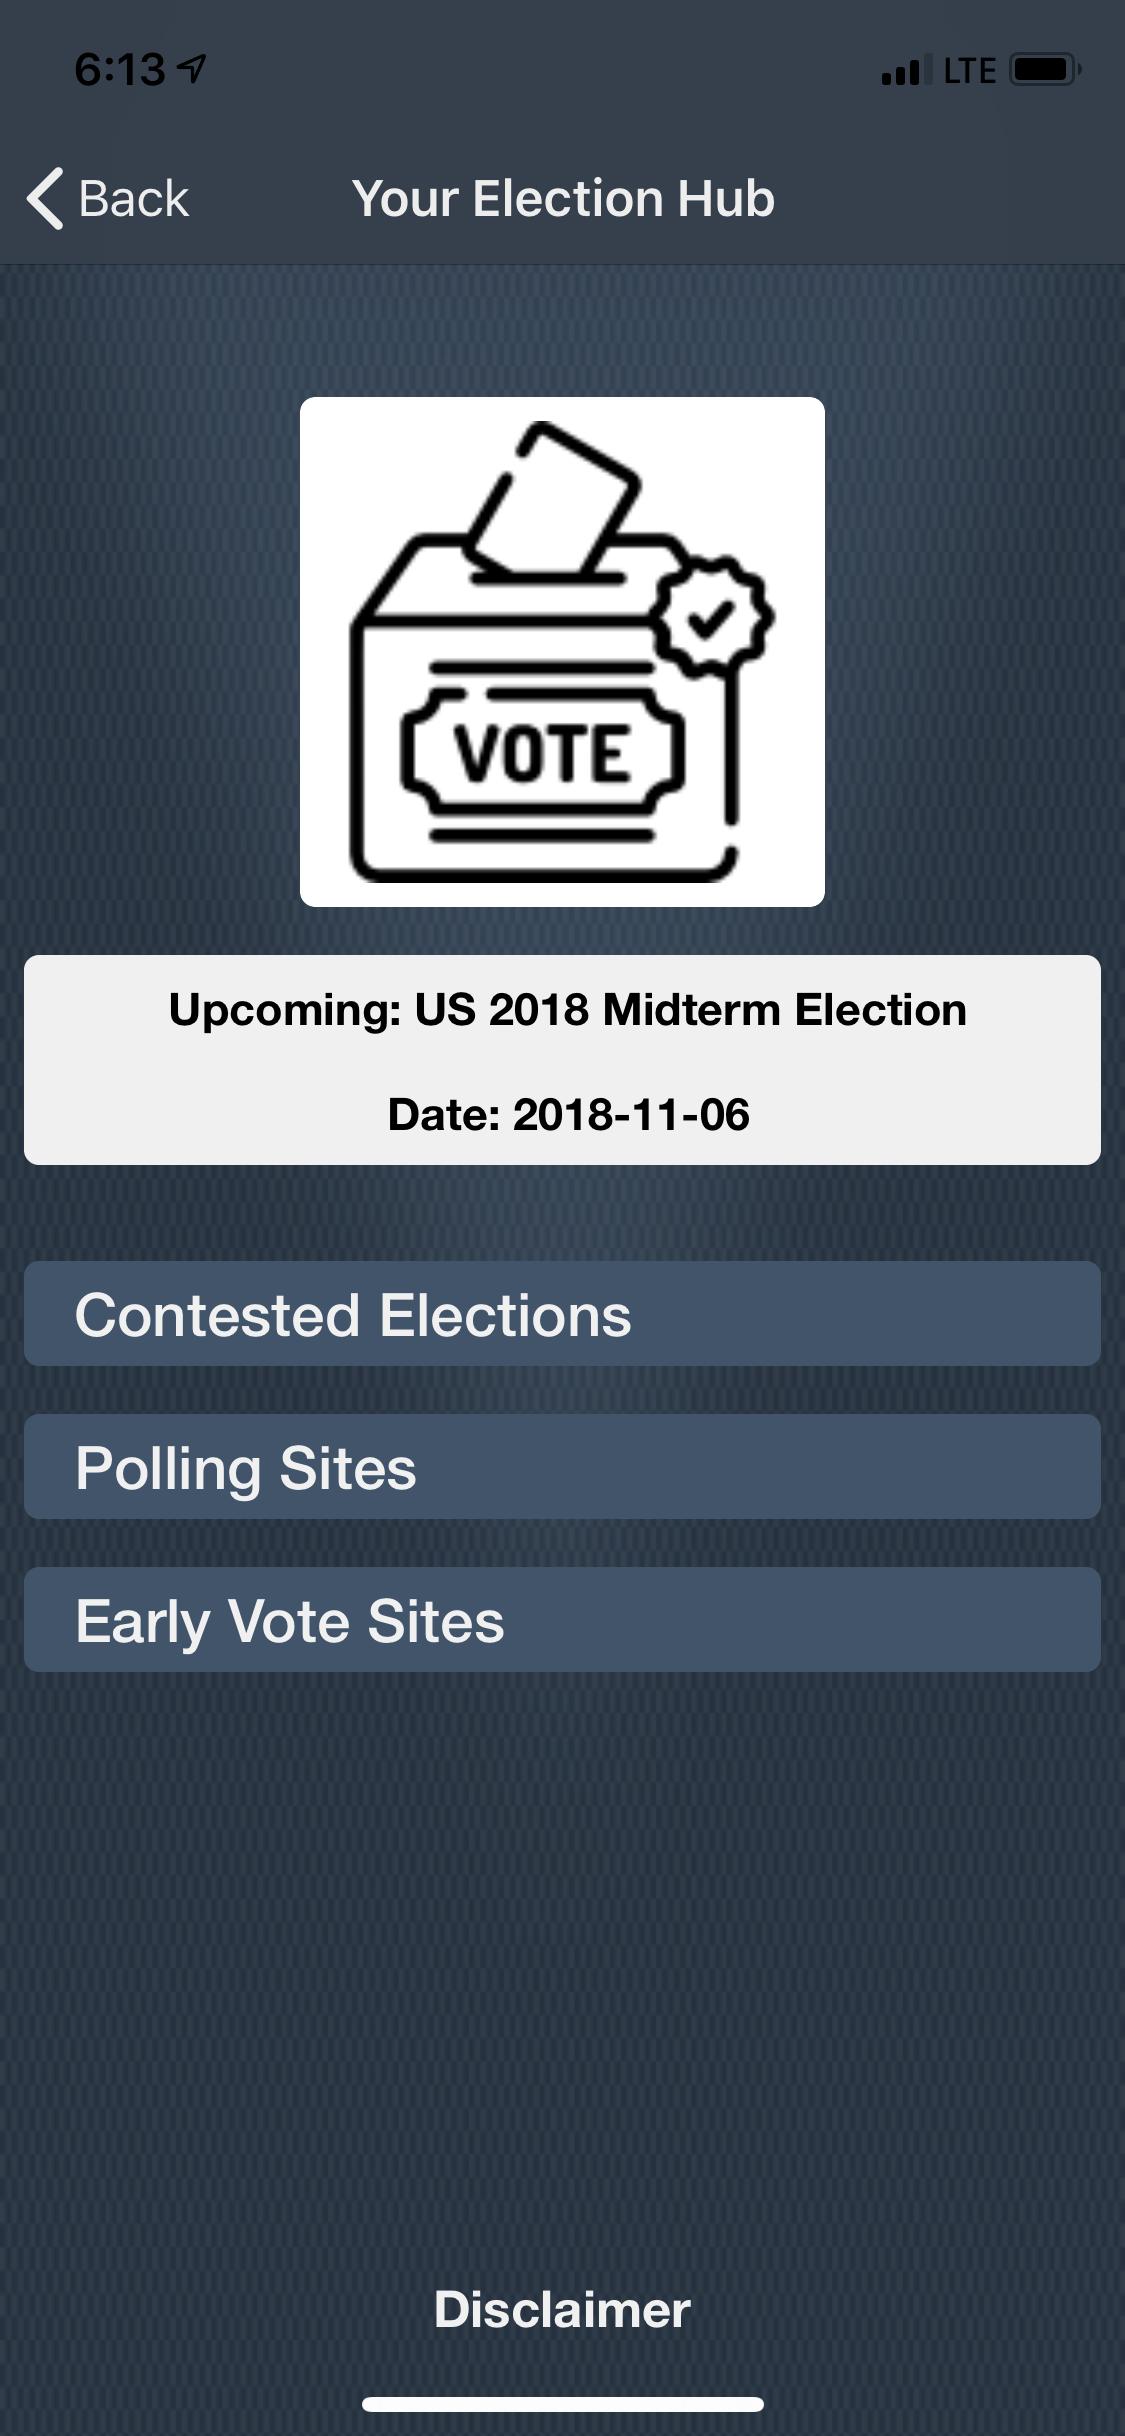 vote, civic, government, midterms, candidate, election, politics, political, campaign, voter, election, elect